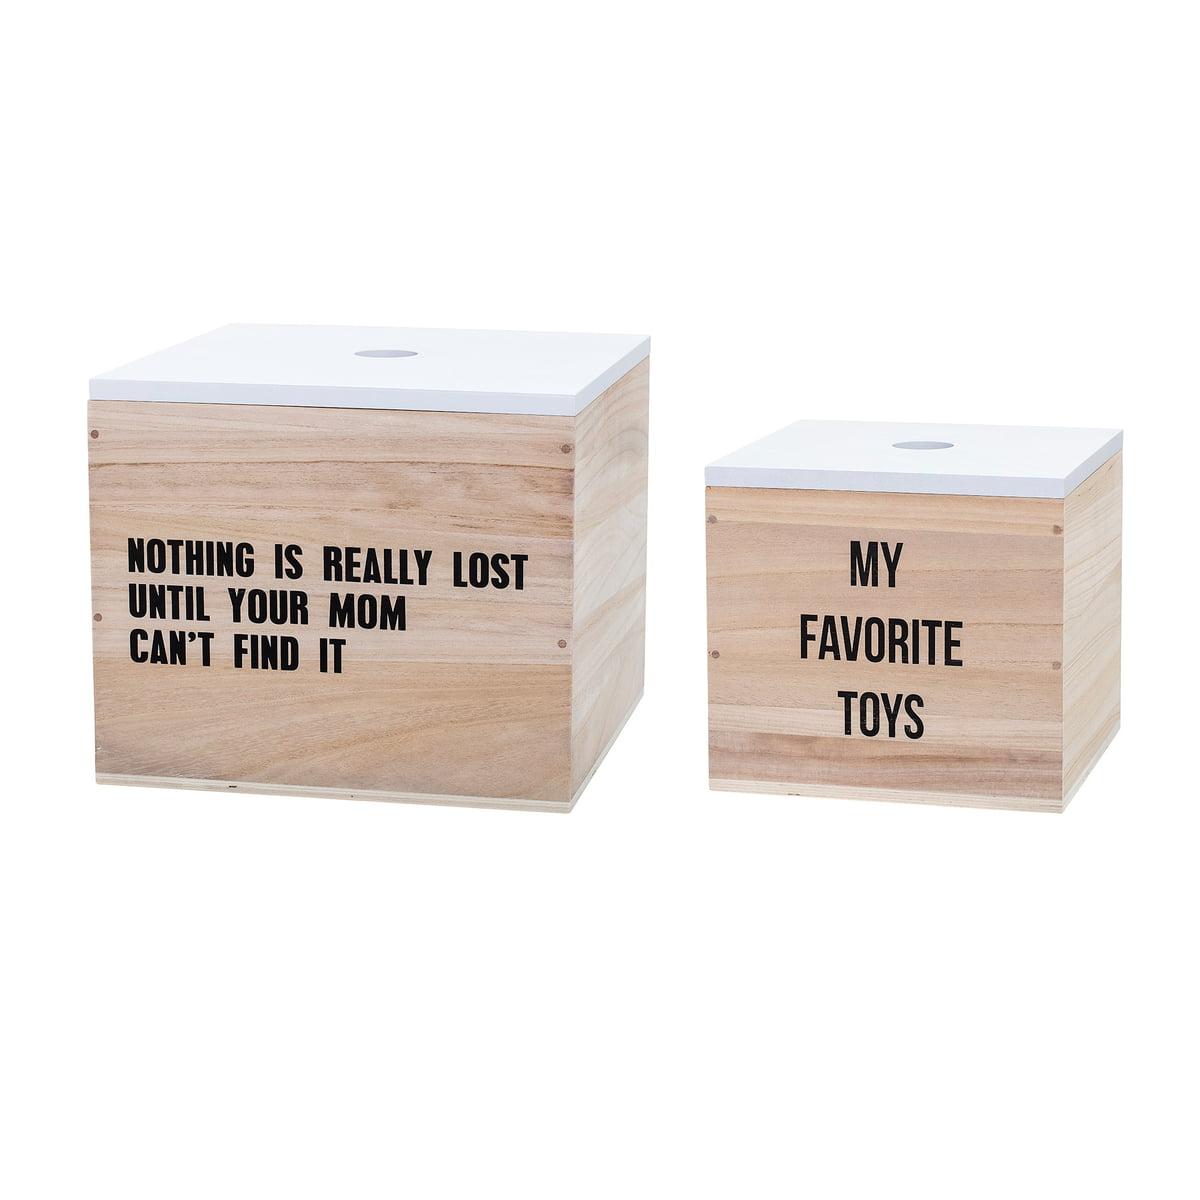 Bloomingville - Spielzeugkiste Text (2er-Set), weiß/ natur | Kinderzimmer > Spielzeuge > Spielzeugkisten | Weiß | Paulownienholz | Bloomingville